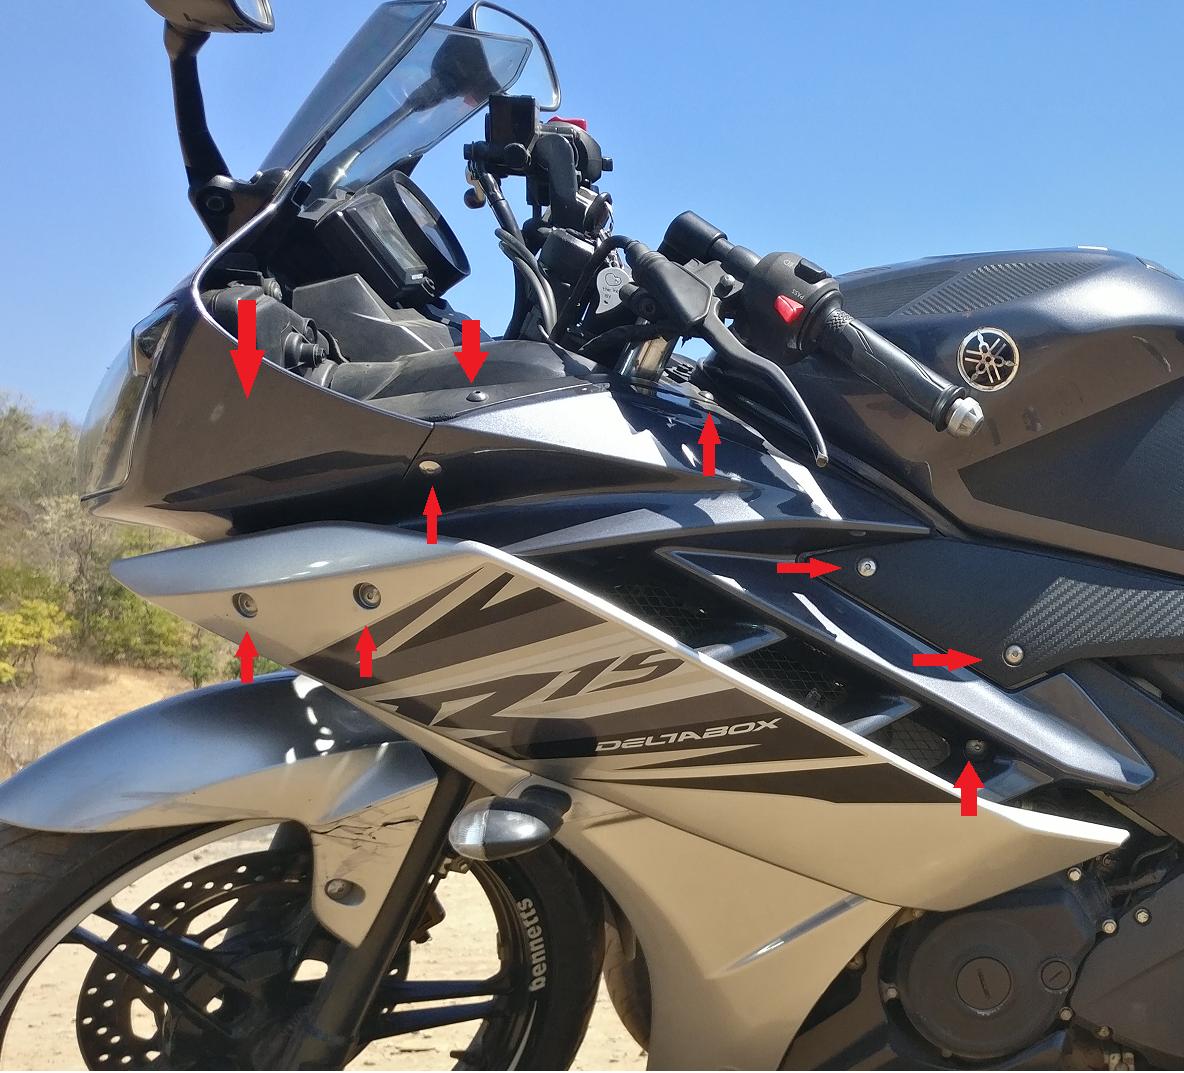 Yamaha R15: Fix in my garage: Clutch and Throttle freeplay